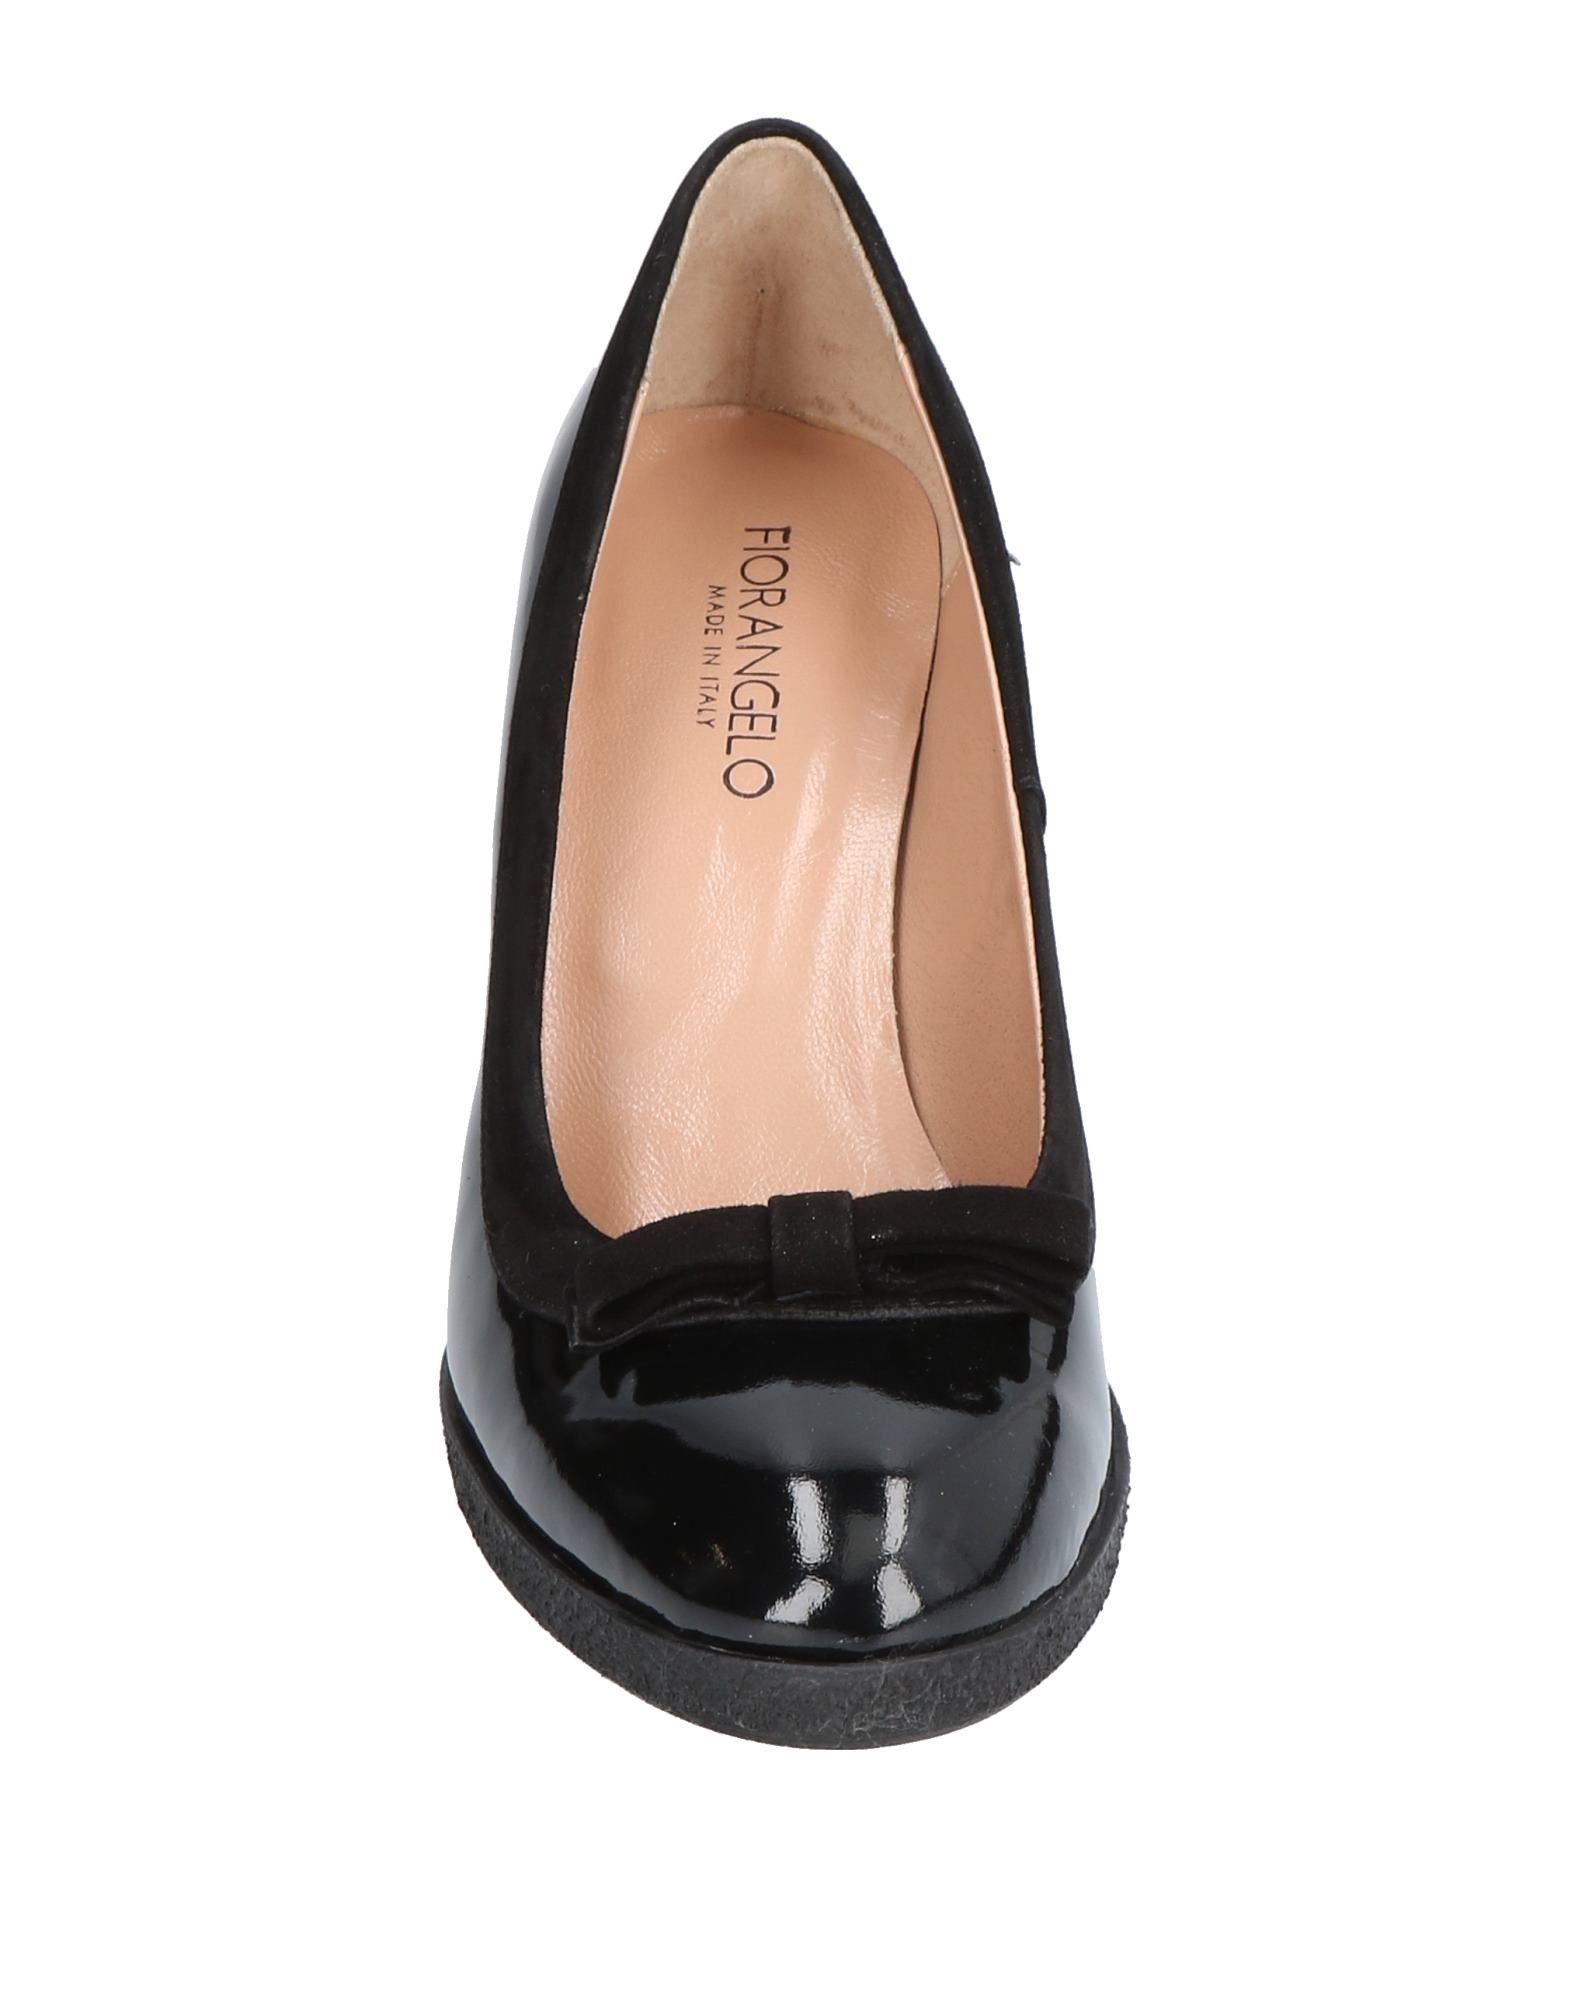 Stilvolle Damen billige Schuhe Fiorangelo Pumps Damen Stilvolle  11448239WP 2bc8e5